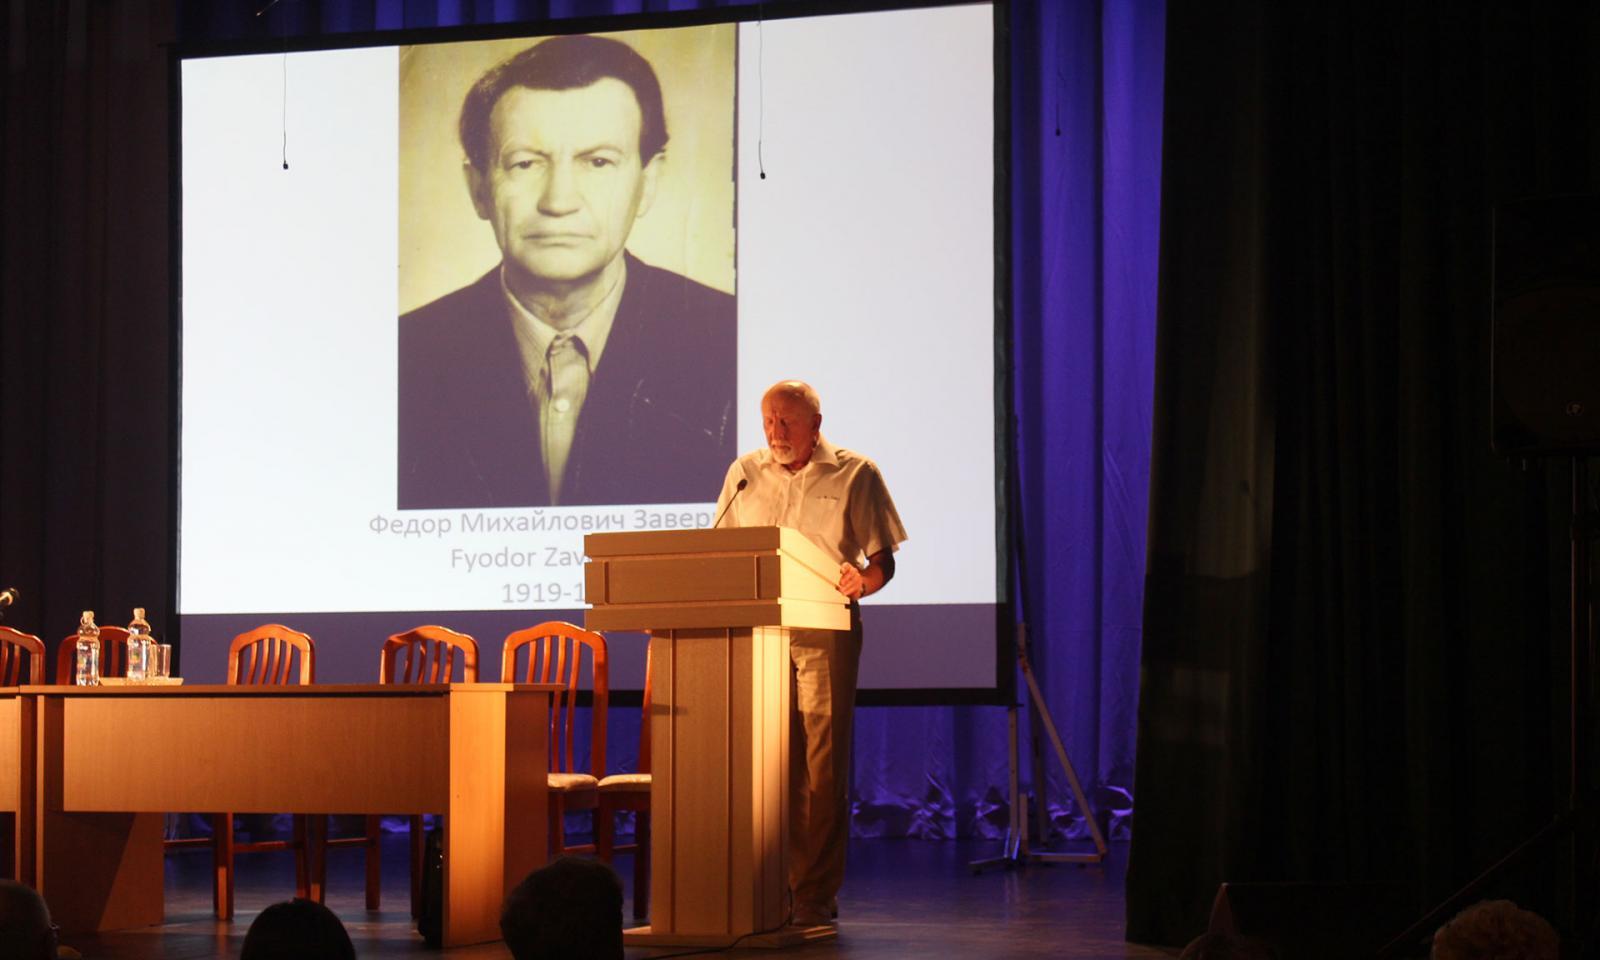 В Брянске открылась международная научная конференция